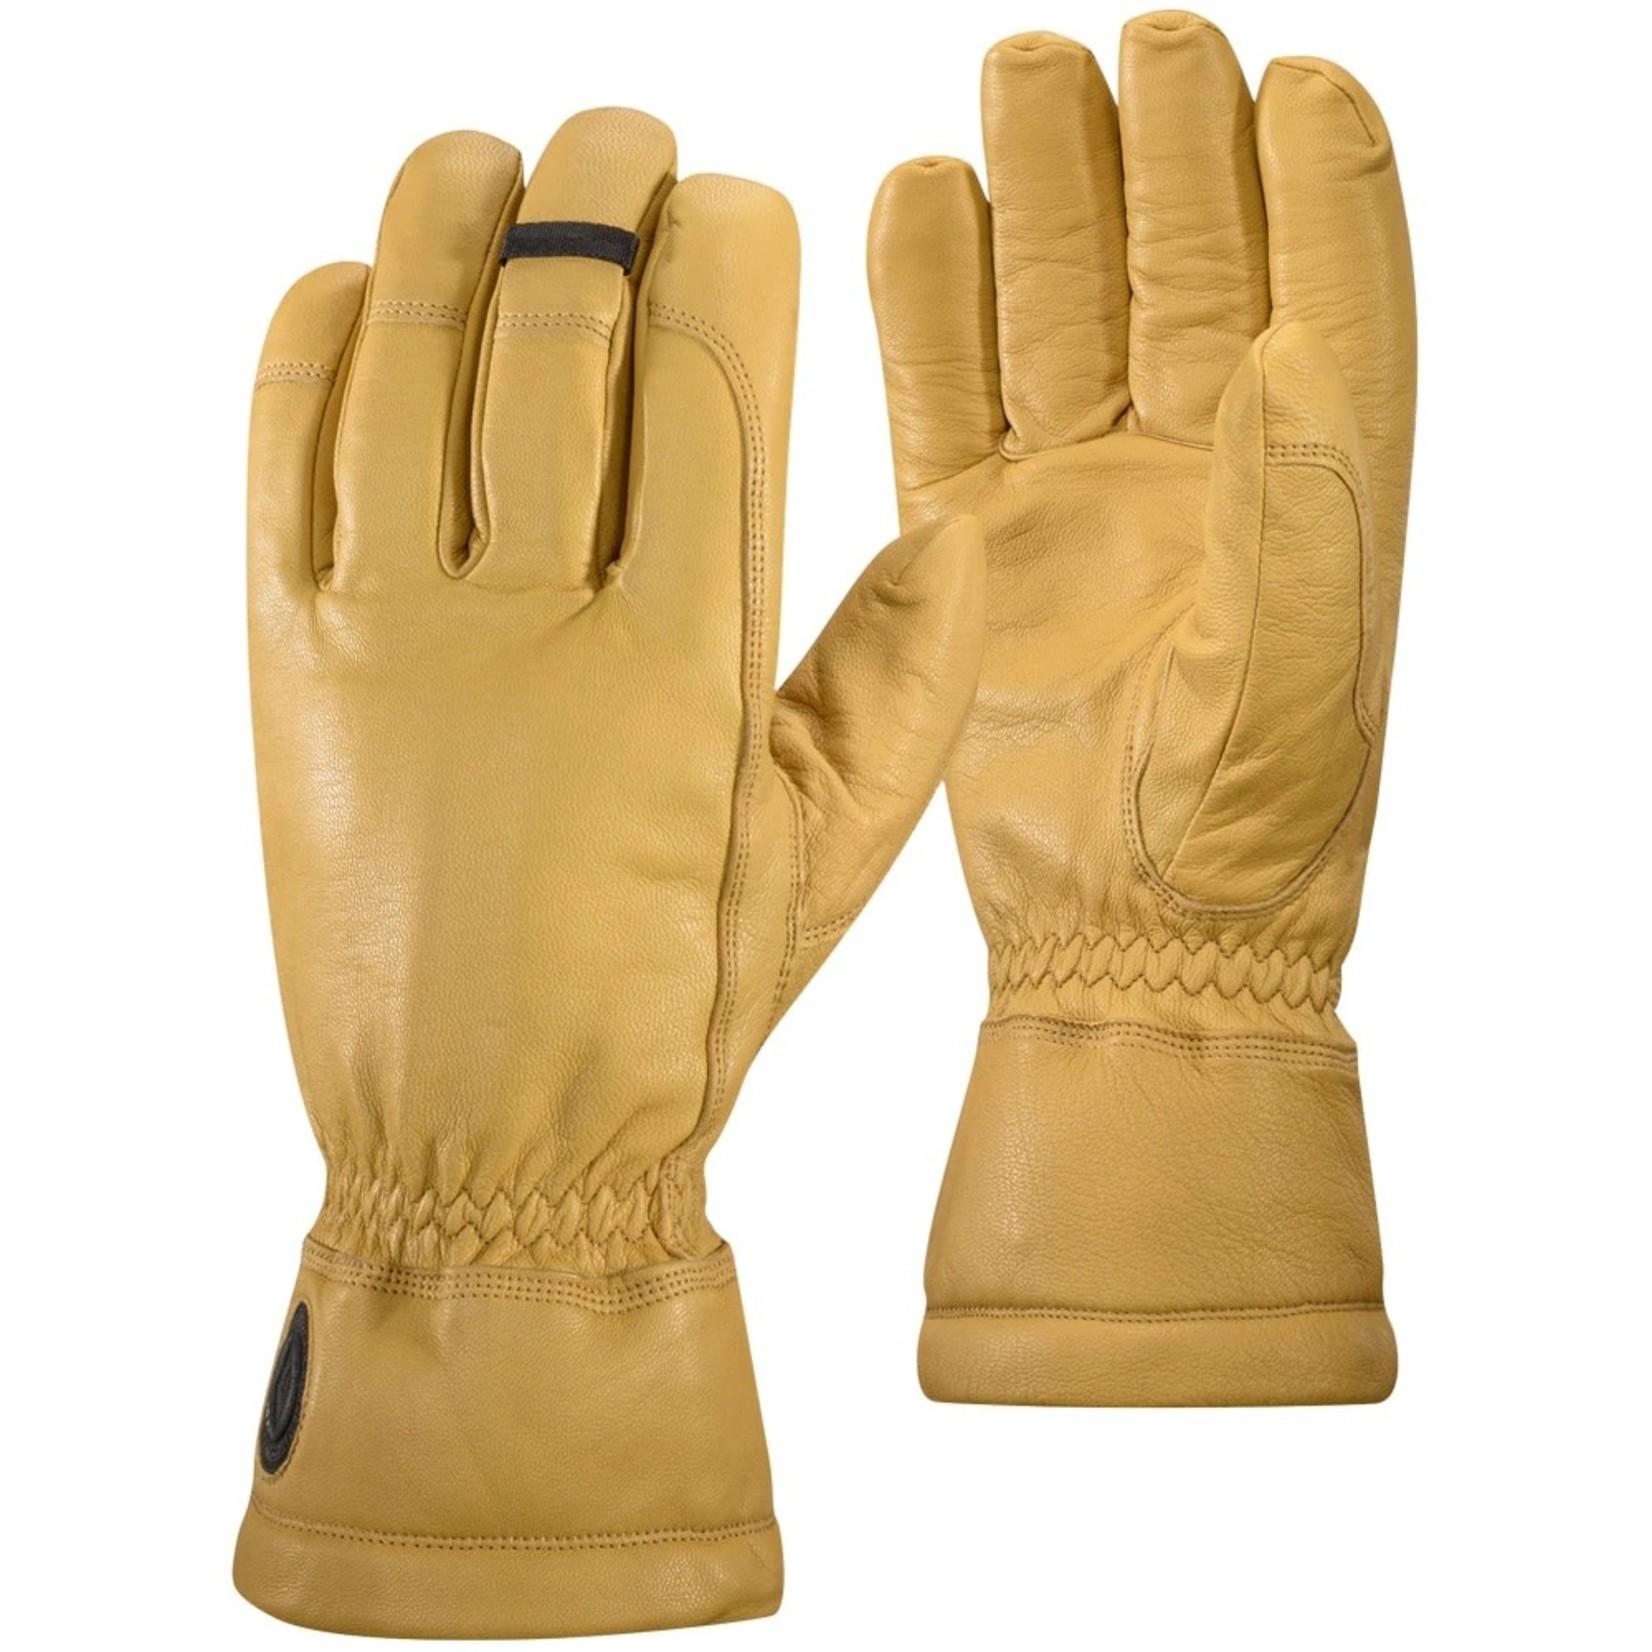 Black Diamond Gants Black Diamond Work Gloves - Unisexe